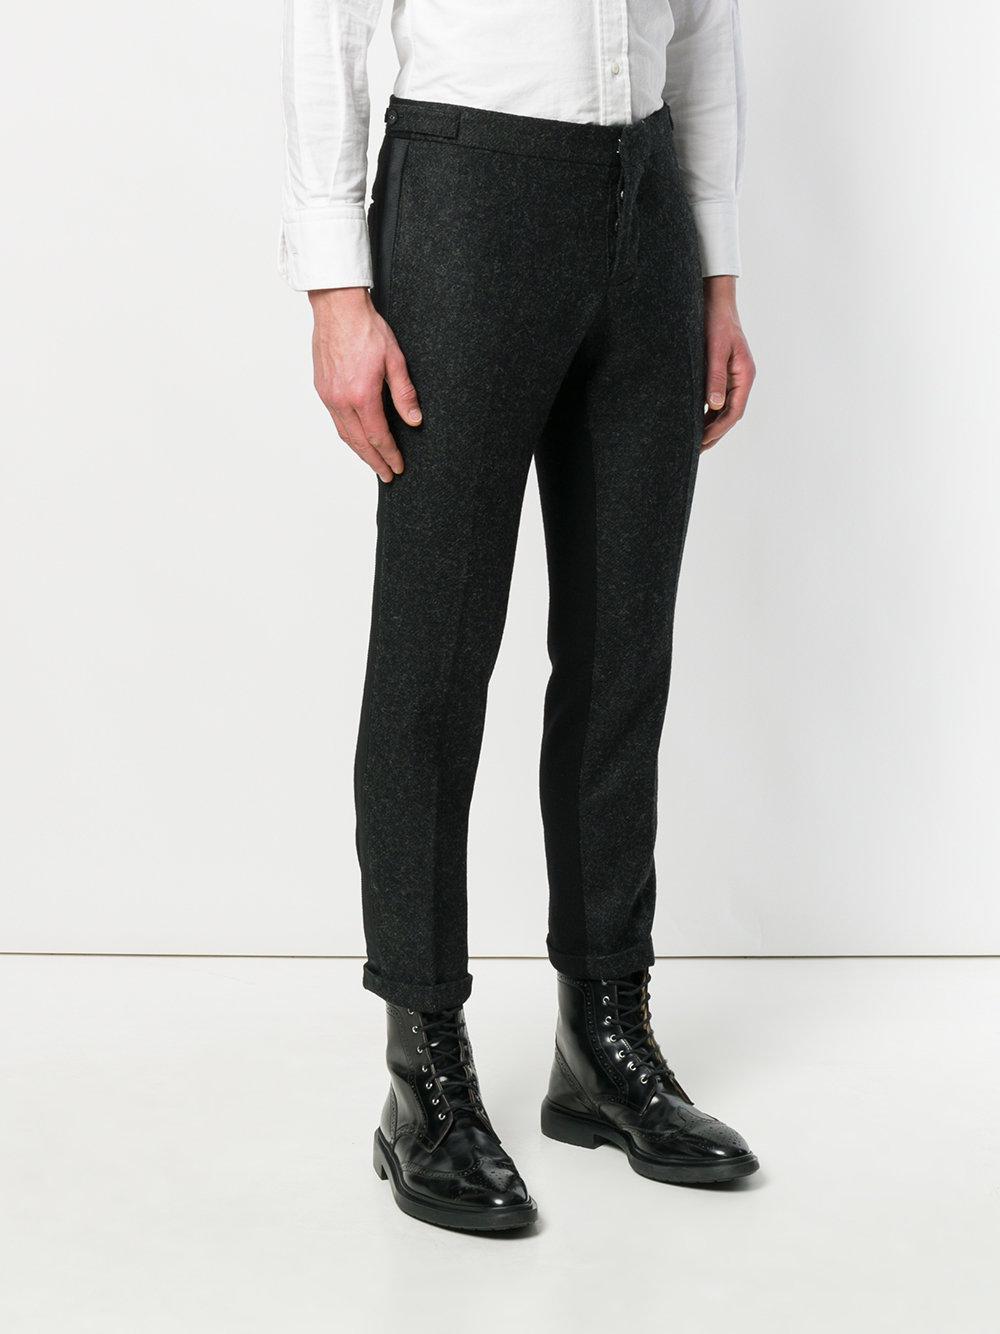 Grosgrain-Tipped Bicolor Skinny Trouser In Shetland Wool - Grey Thom Browne 9sOhr2457E